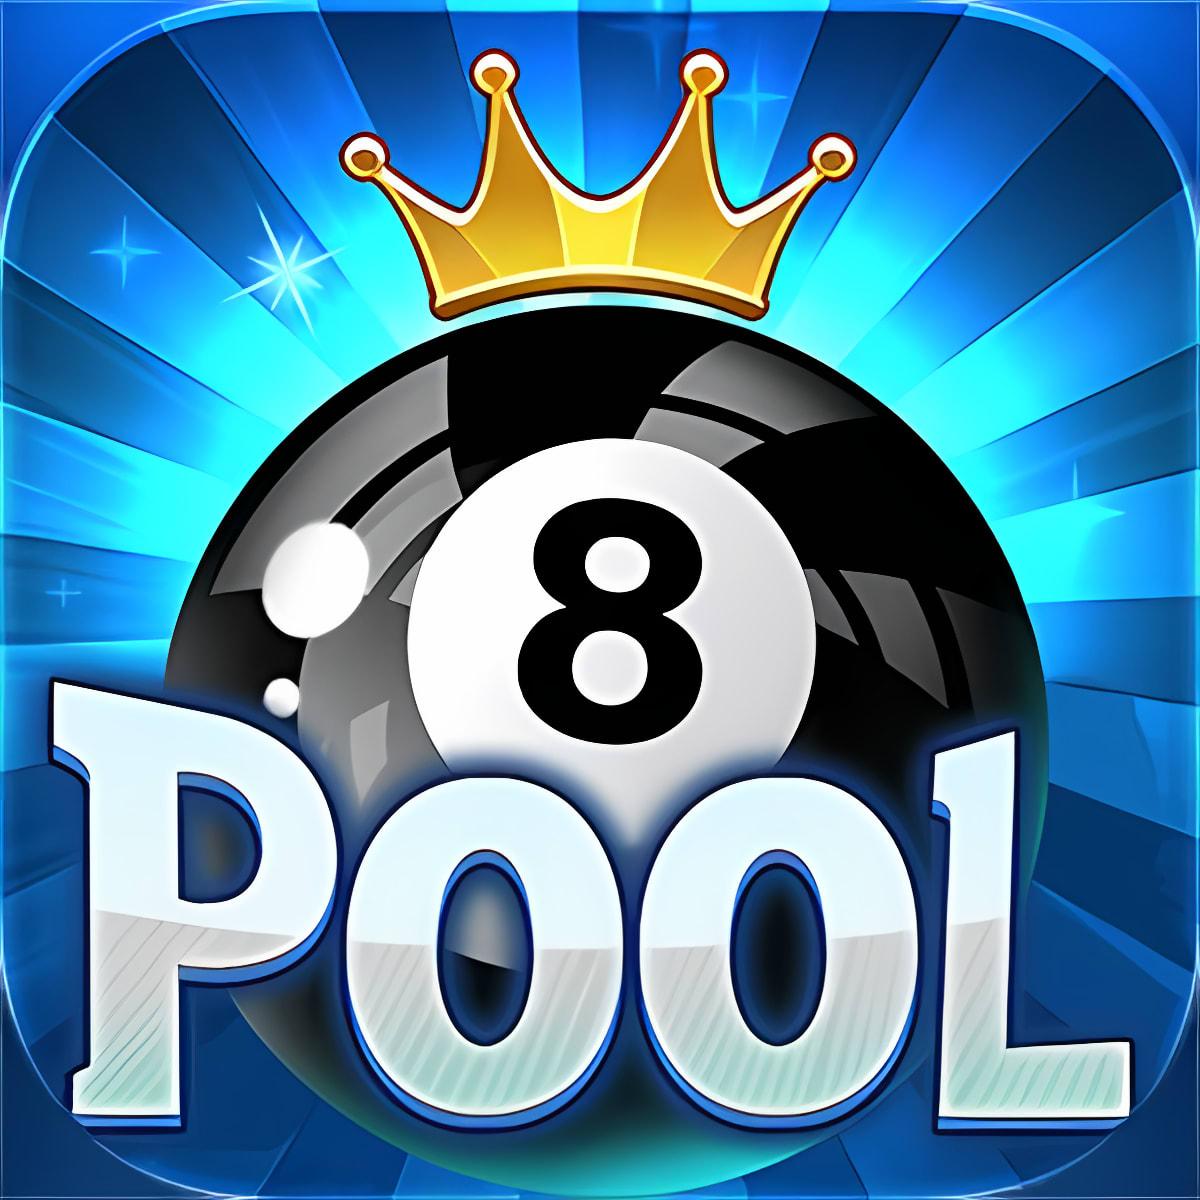 9 Ball Pool Billard varies-with-device